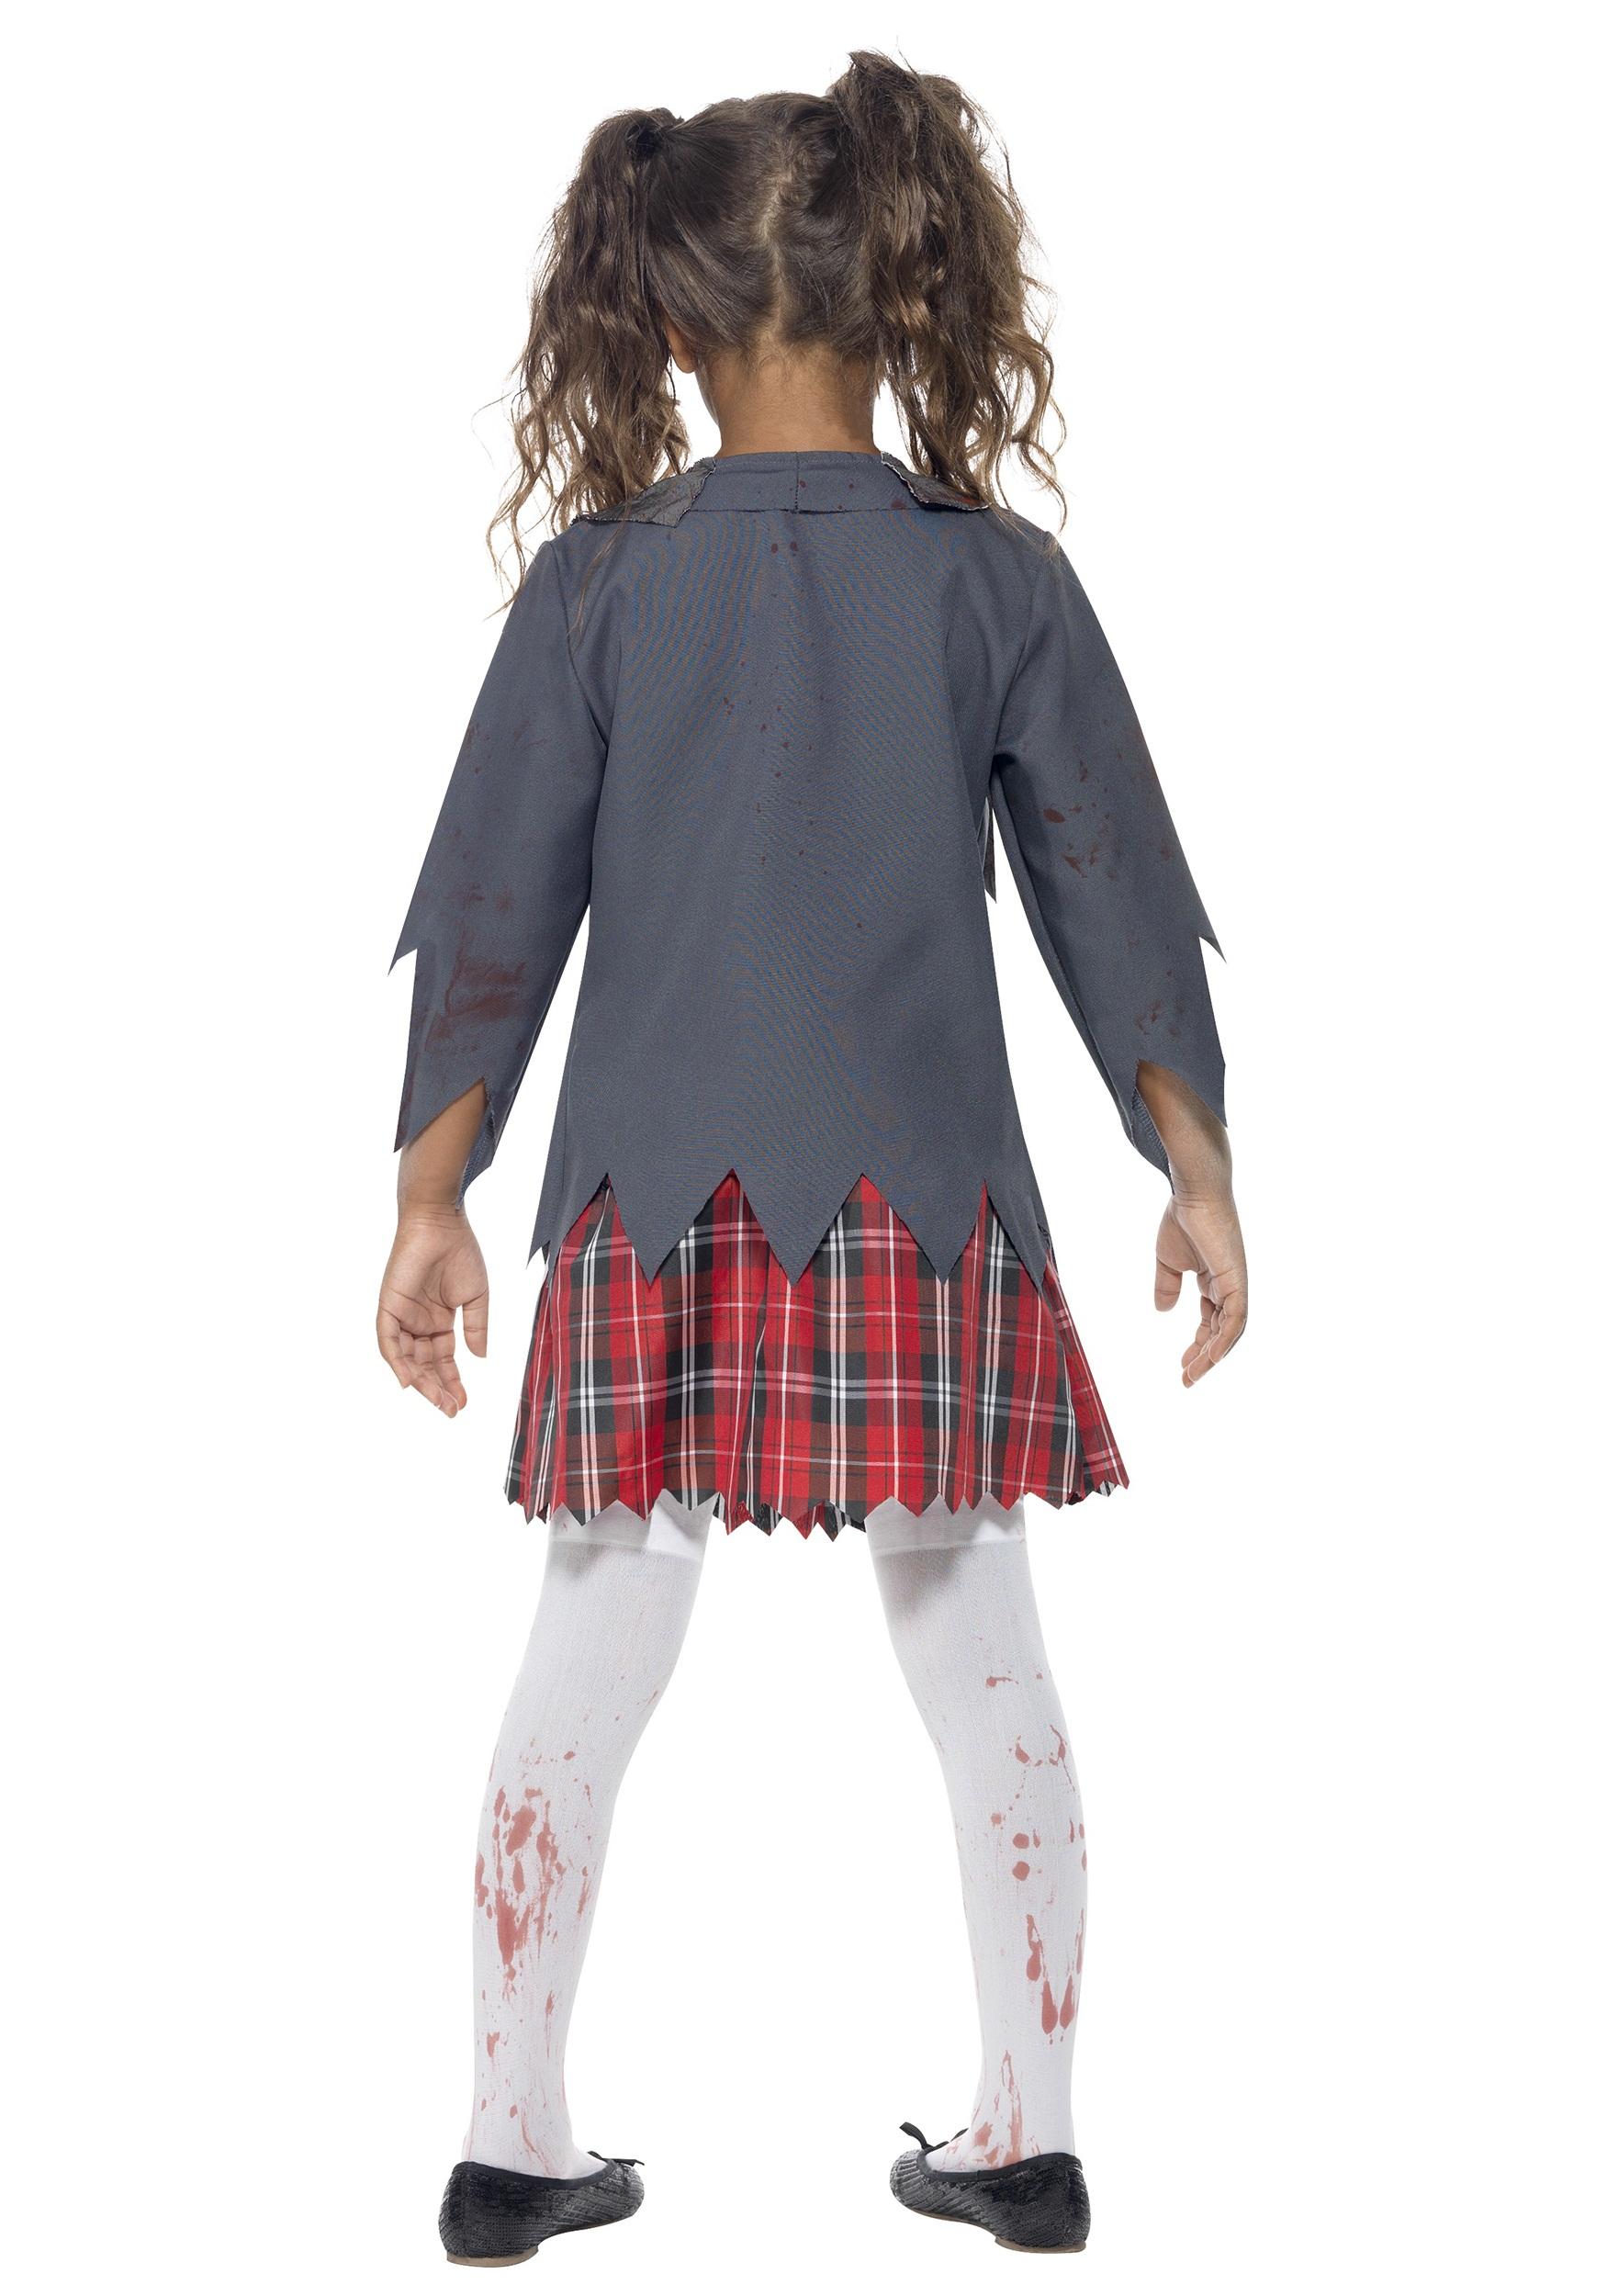 Zombie School Girl Costume For Kids-5561